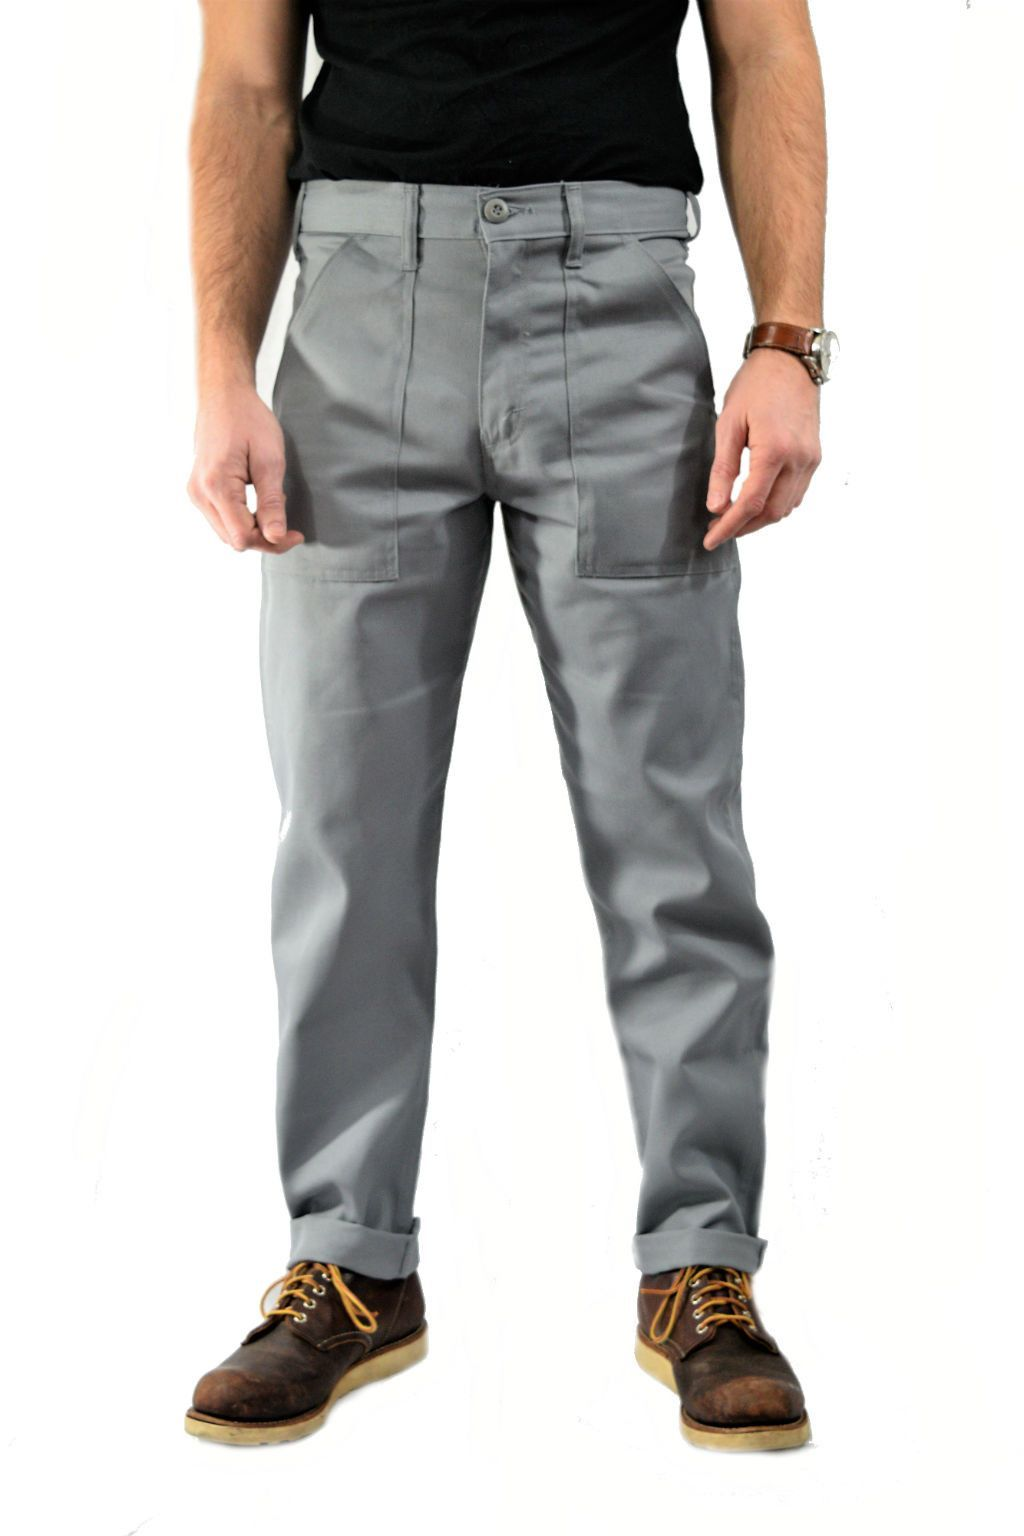 SLIM 4 POCKET FATIGUE PANTS - PRISON GREY